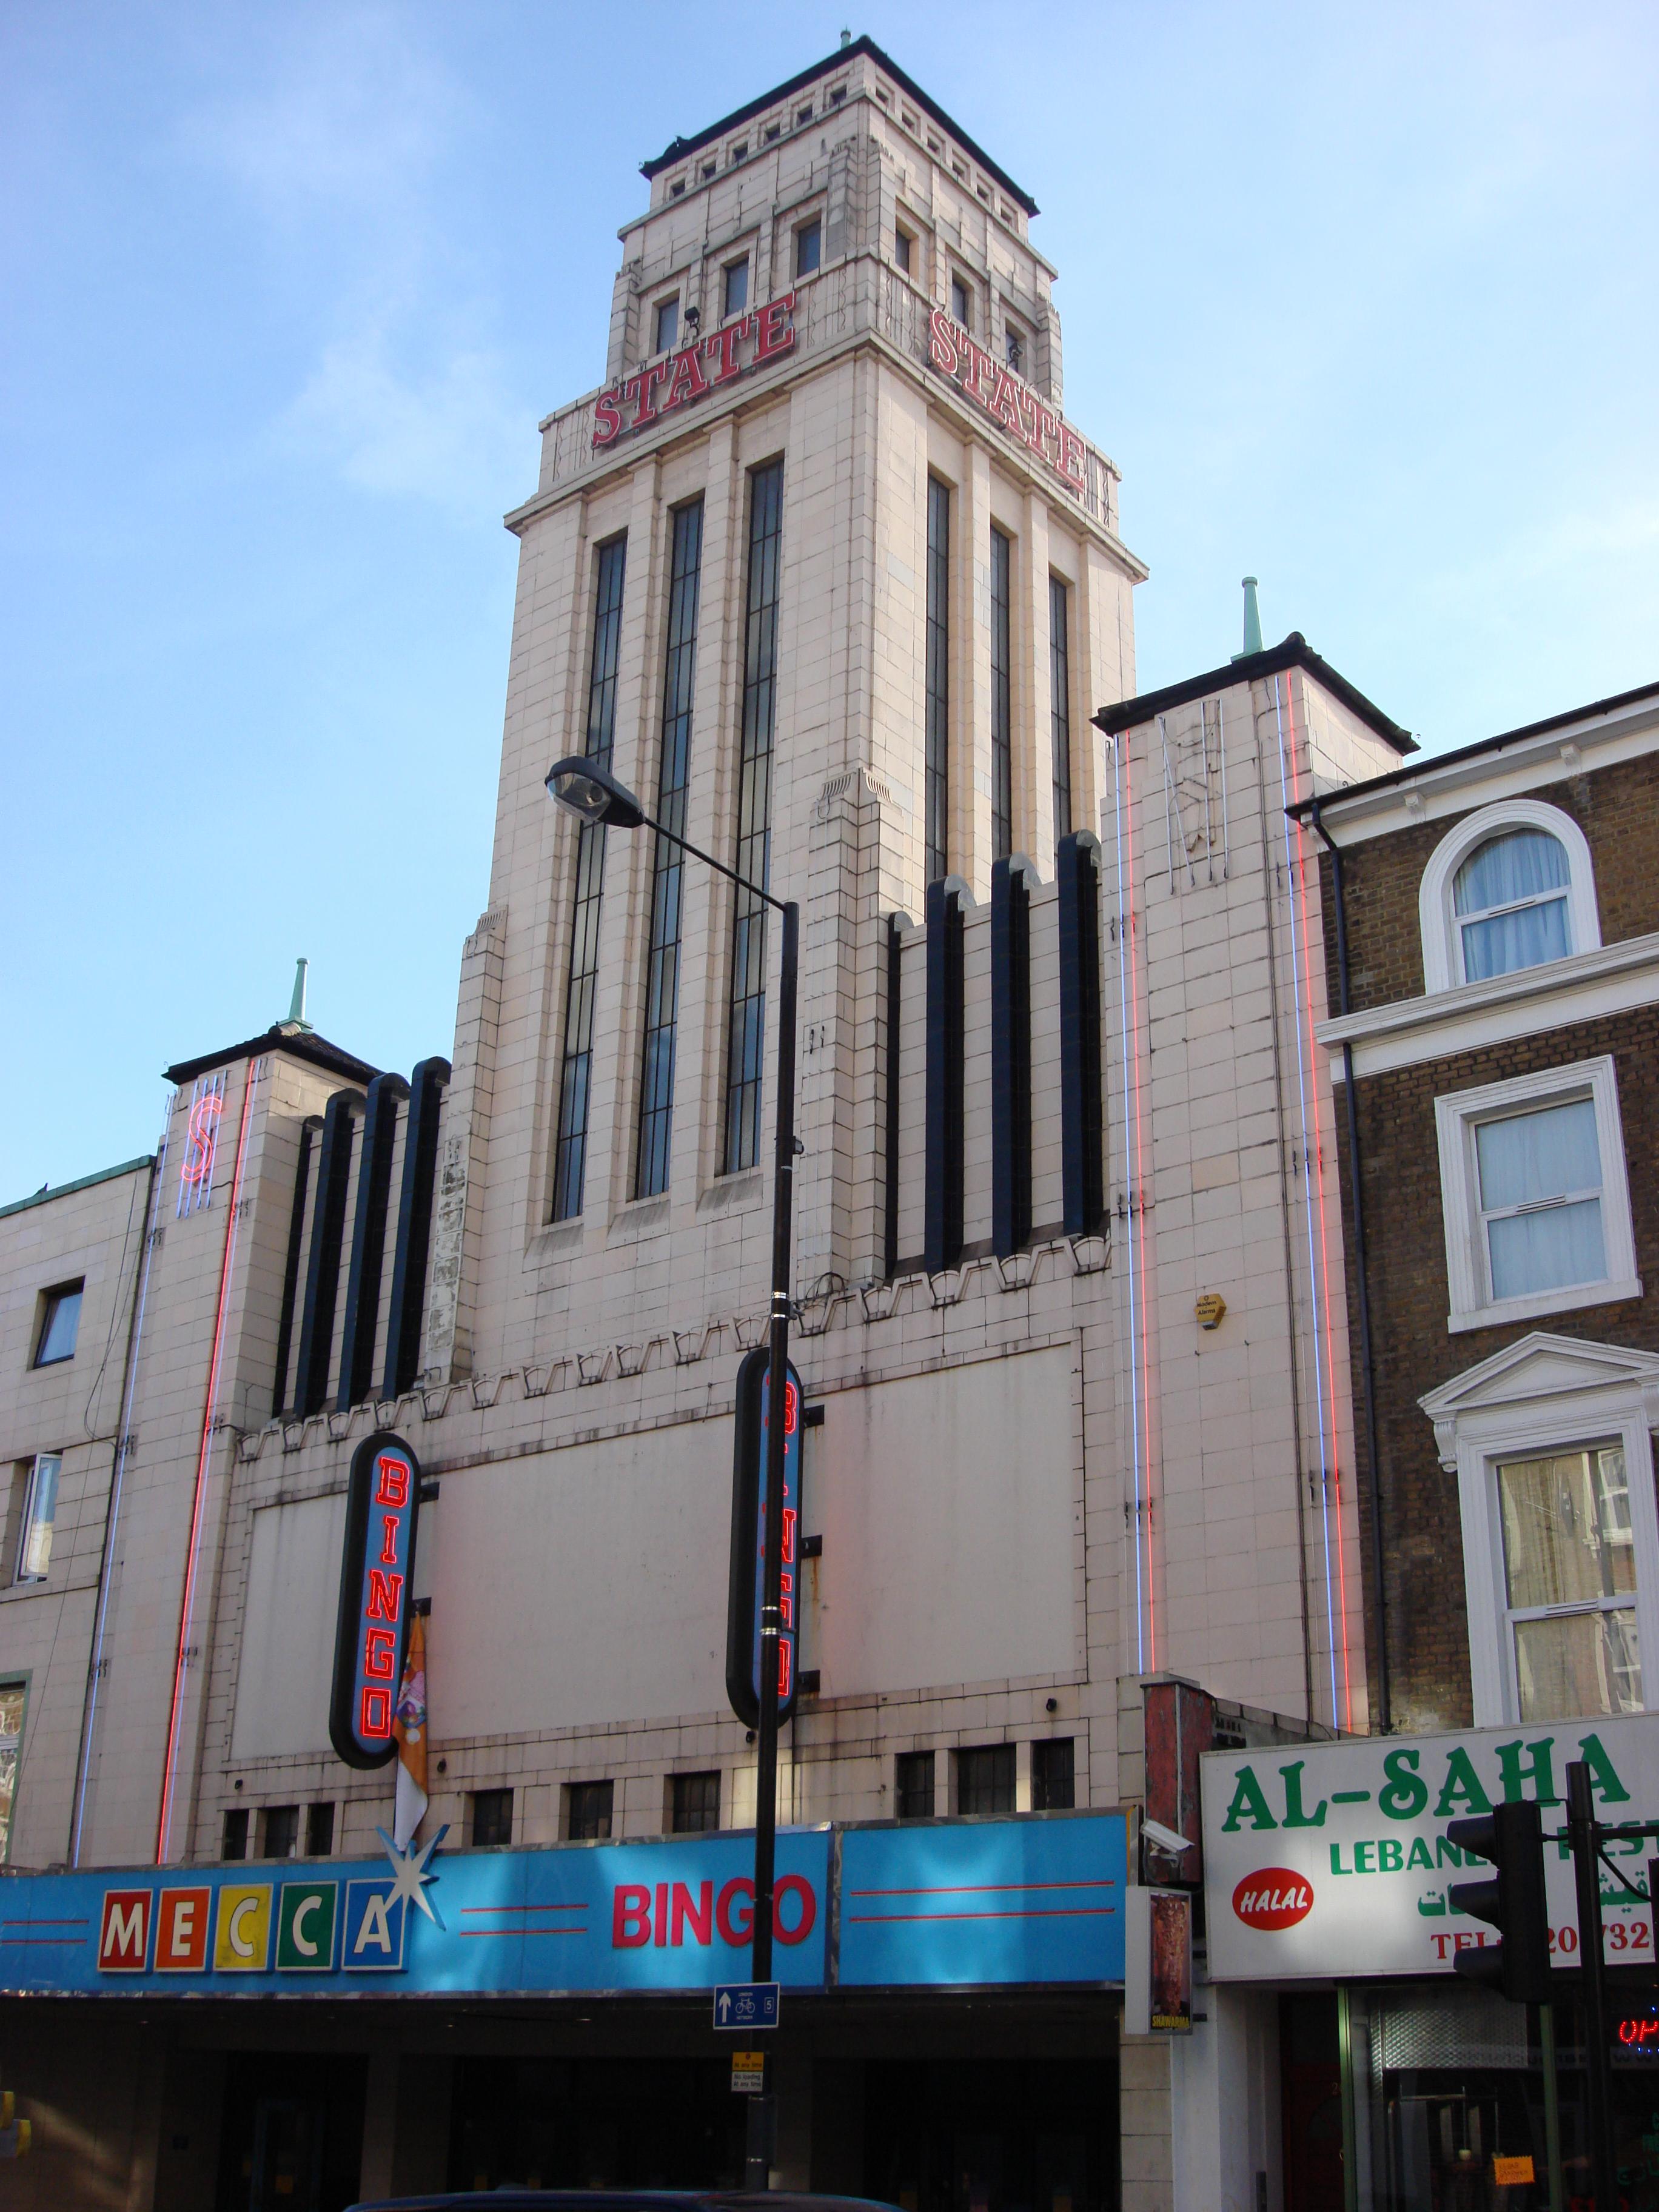 https://upload.wikimedia.org/wikipedia/commons/b/b1/Gaumont_State_Cinema_Entrance.jpg